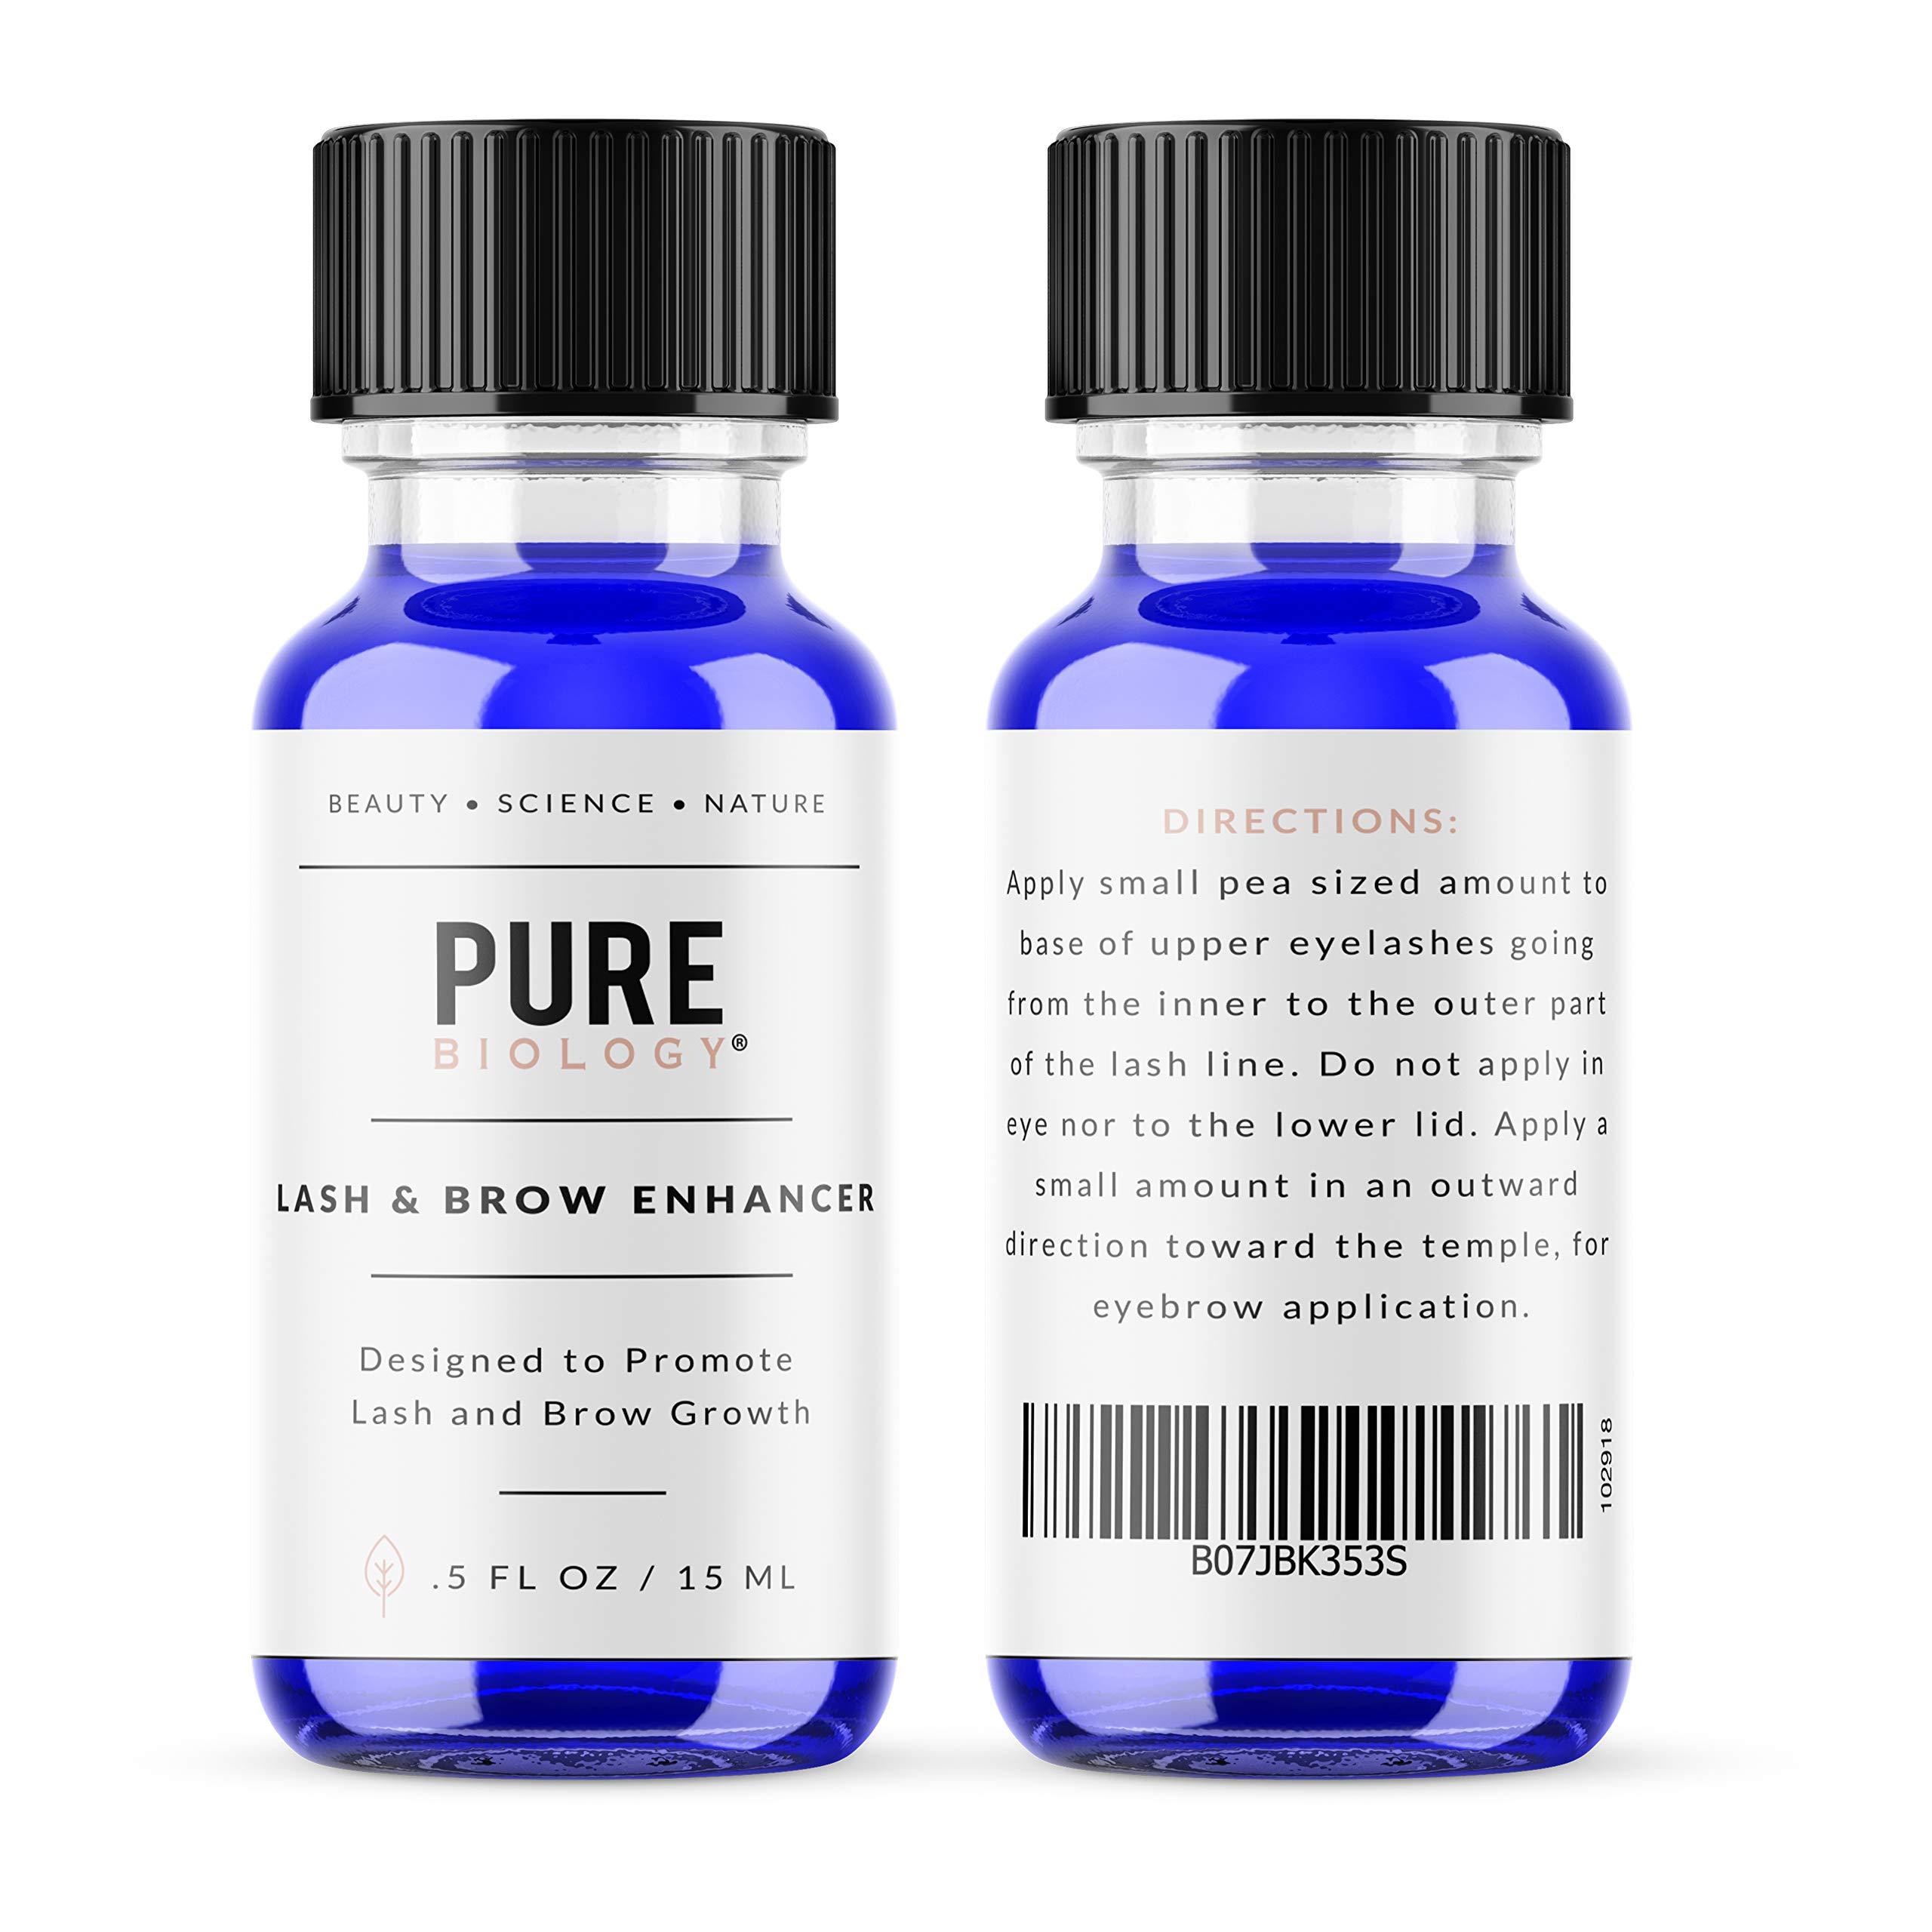 Premium Eyelash Growth Serum & Eyebrow Enhancer - Castor Oil, Biotin, Green Tea Extract, Natural DHT Blockers & Breakthrough Hair Growth Stimulating Complex for Men & Women by Pure Biology (Image #4)